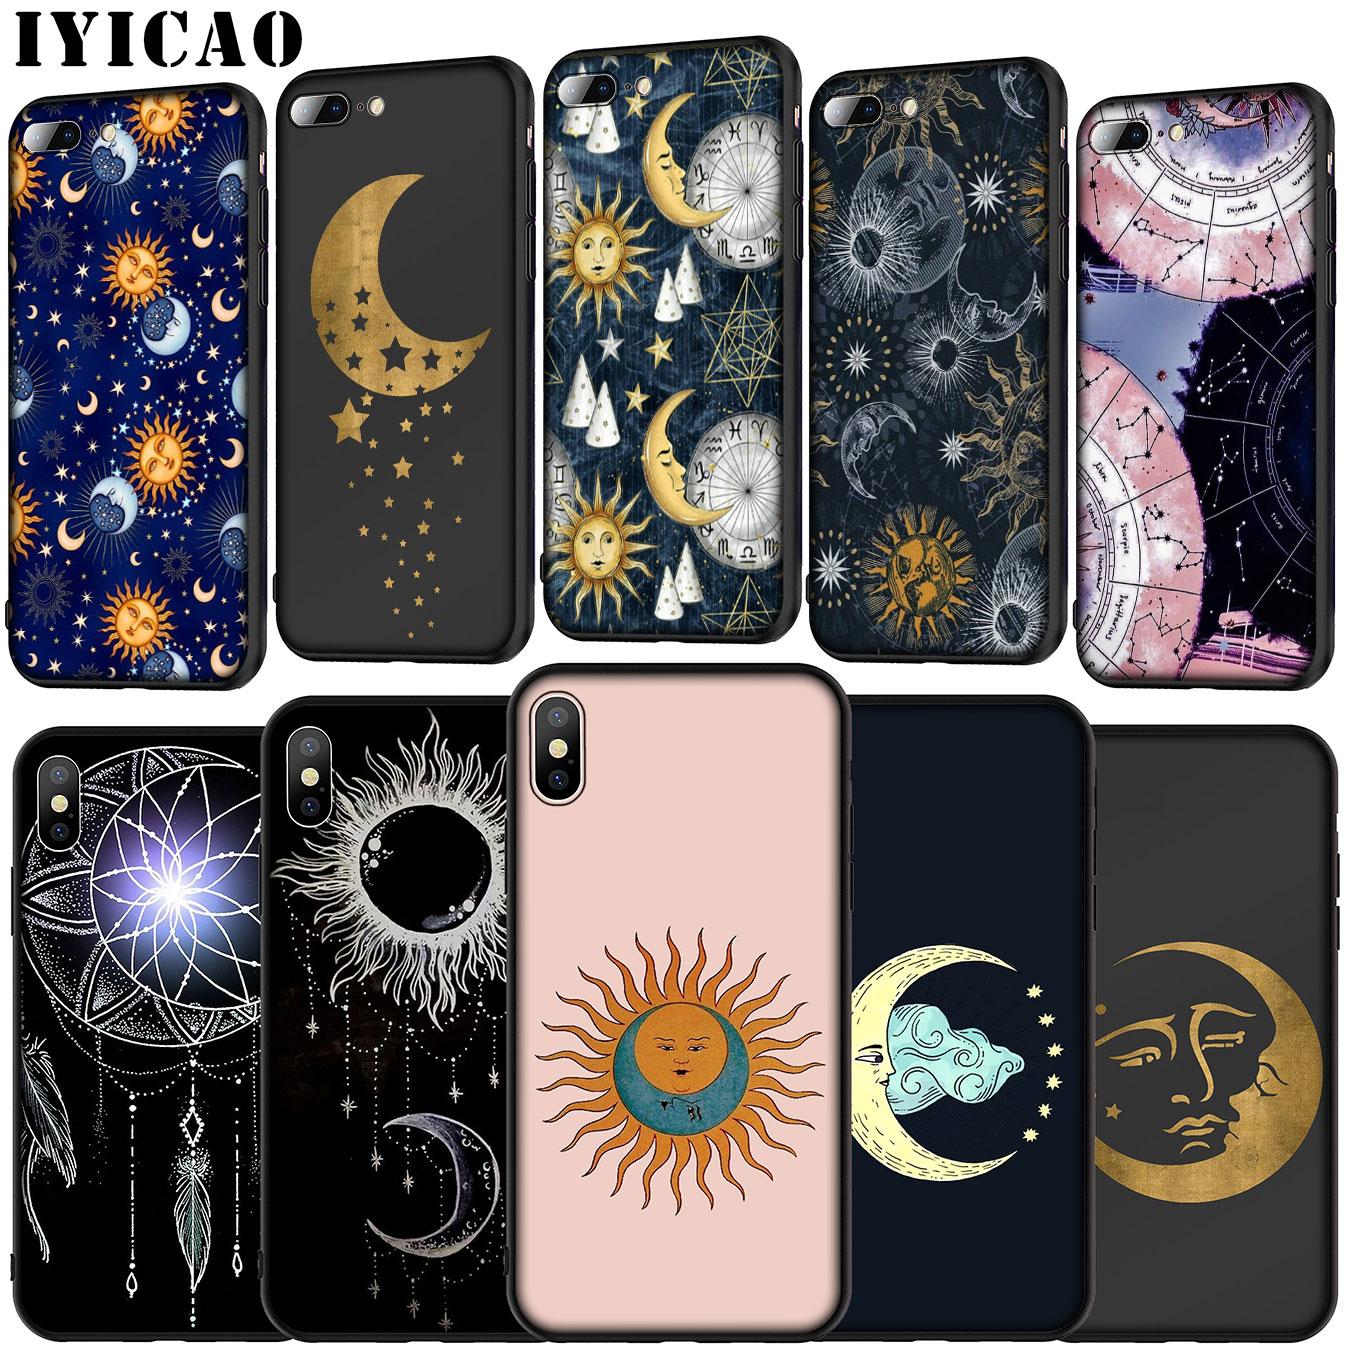 Iyicao ouro lua e sol estético macio silicone caso para huawei p30 p20 pro p10 p9 lite mini 2017 2016 p inteligente z plus 2019